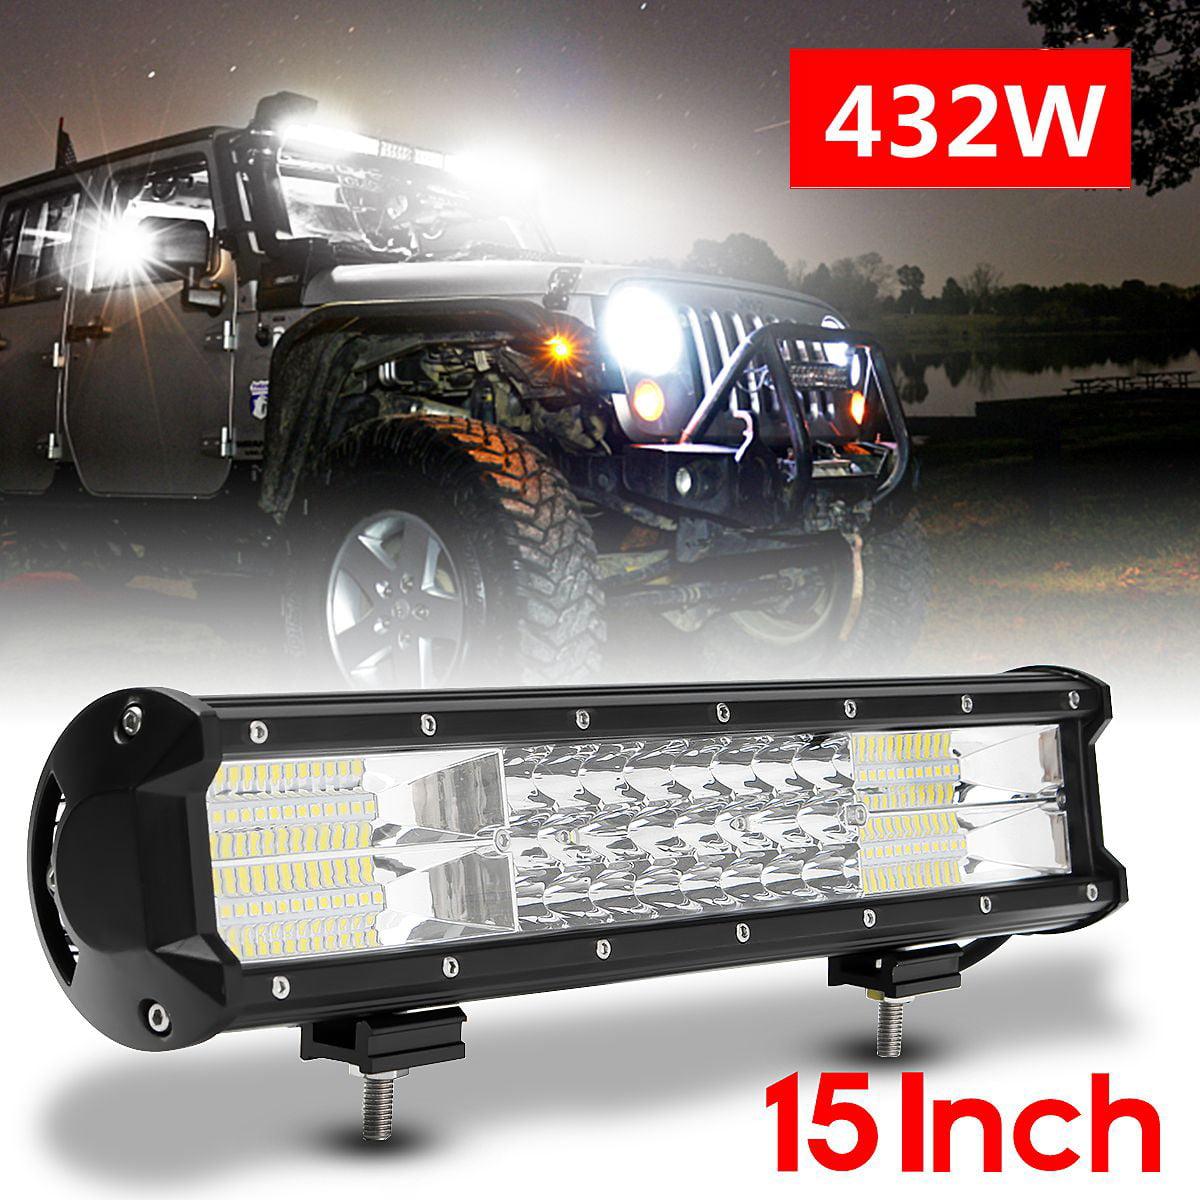 15'' 432W 72 LED Car LED Work Light Bar Flood Combo Strip Driving Night Lamps Fog Light for Off Road  SUV